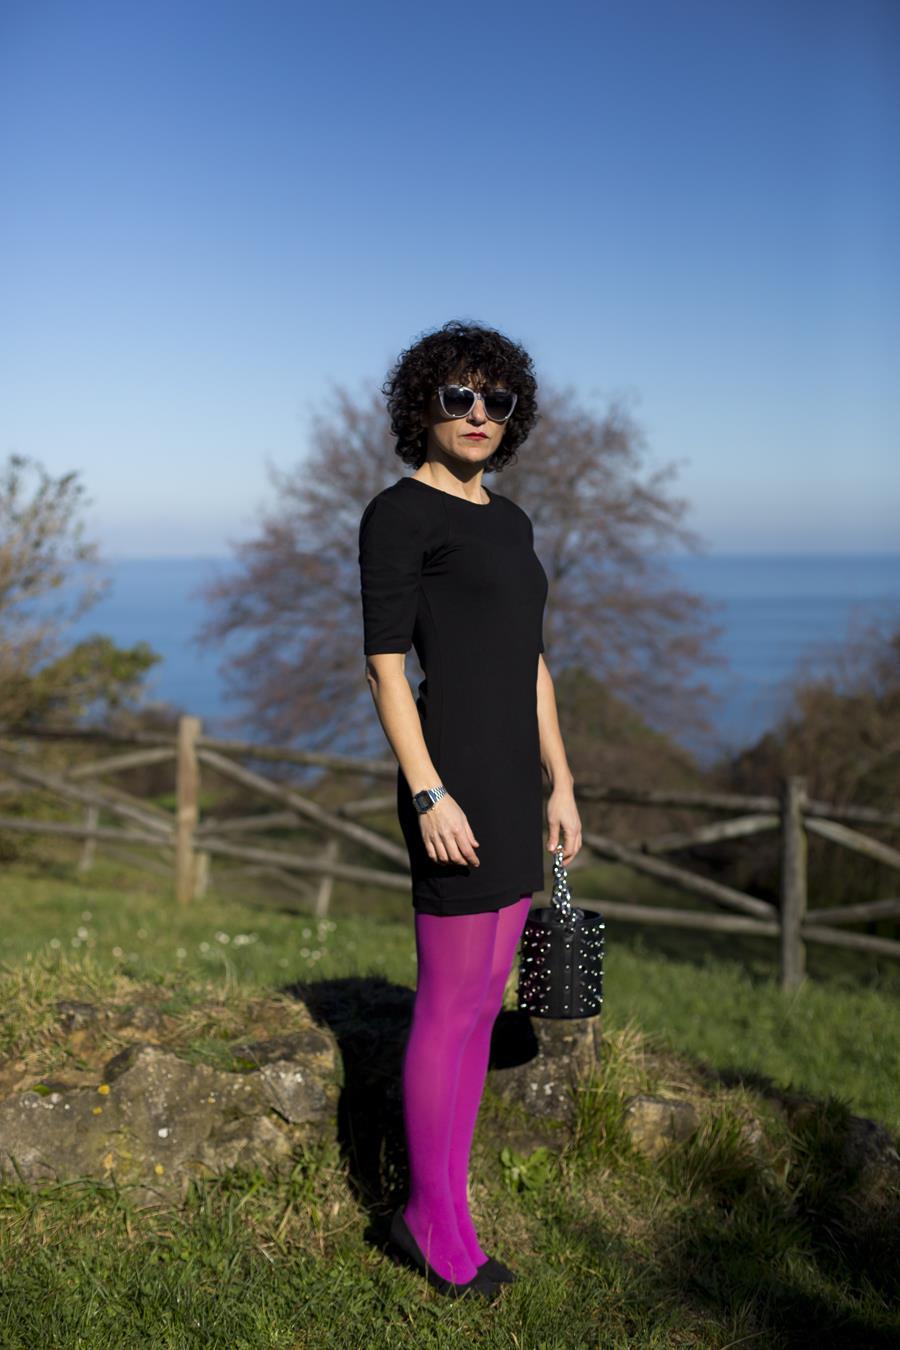 Rebeca Valdivia, asesora de imagen, personal shopper, estilista, stilist, Donostia, San Sebastián, Miss Clov, curls, rizos, black dress, vestido negro, zapatos salón, stilettos, Heel shoes, colour socks, medias de colores, medias rosas, bolso tachuelas, tachas bag, maxi bufanda, maxi pañuelo cuadros, Zumaia